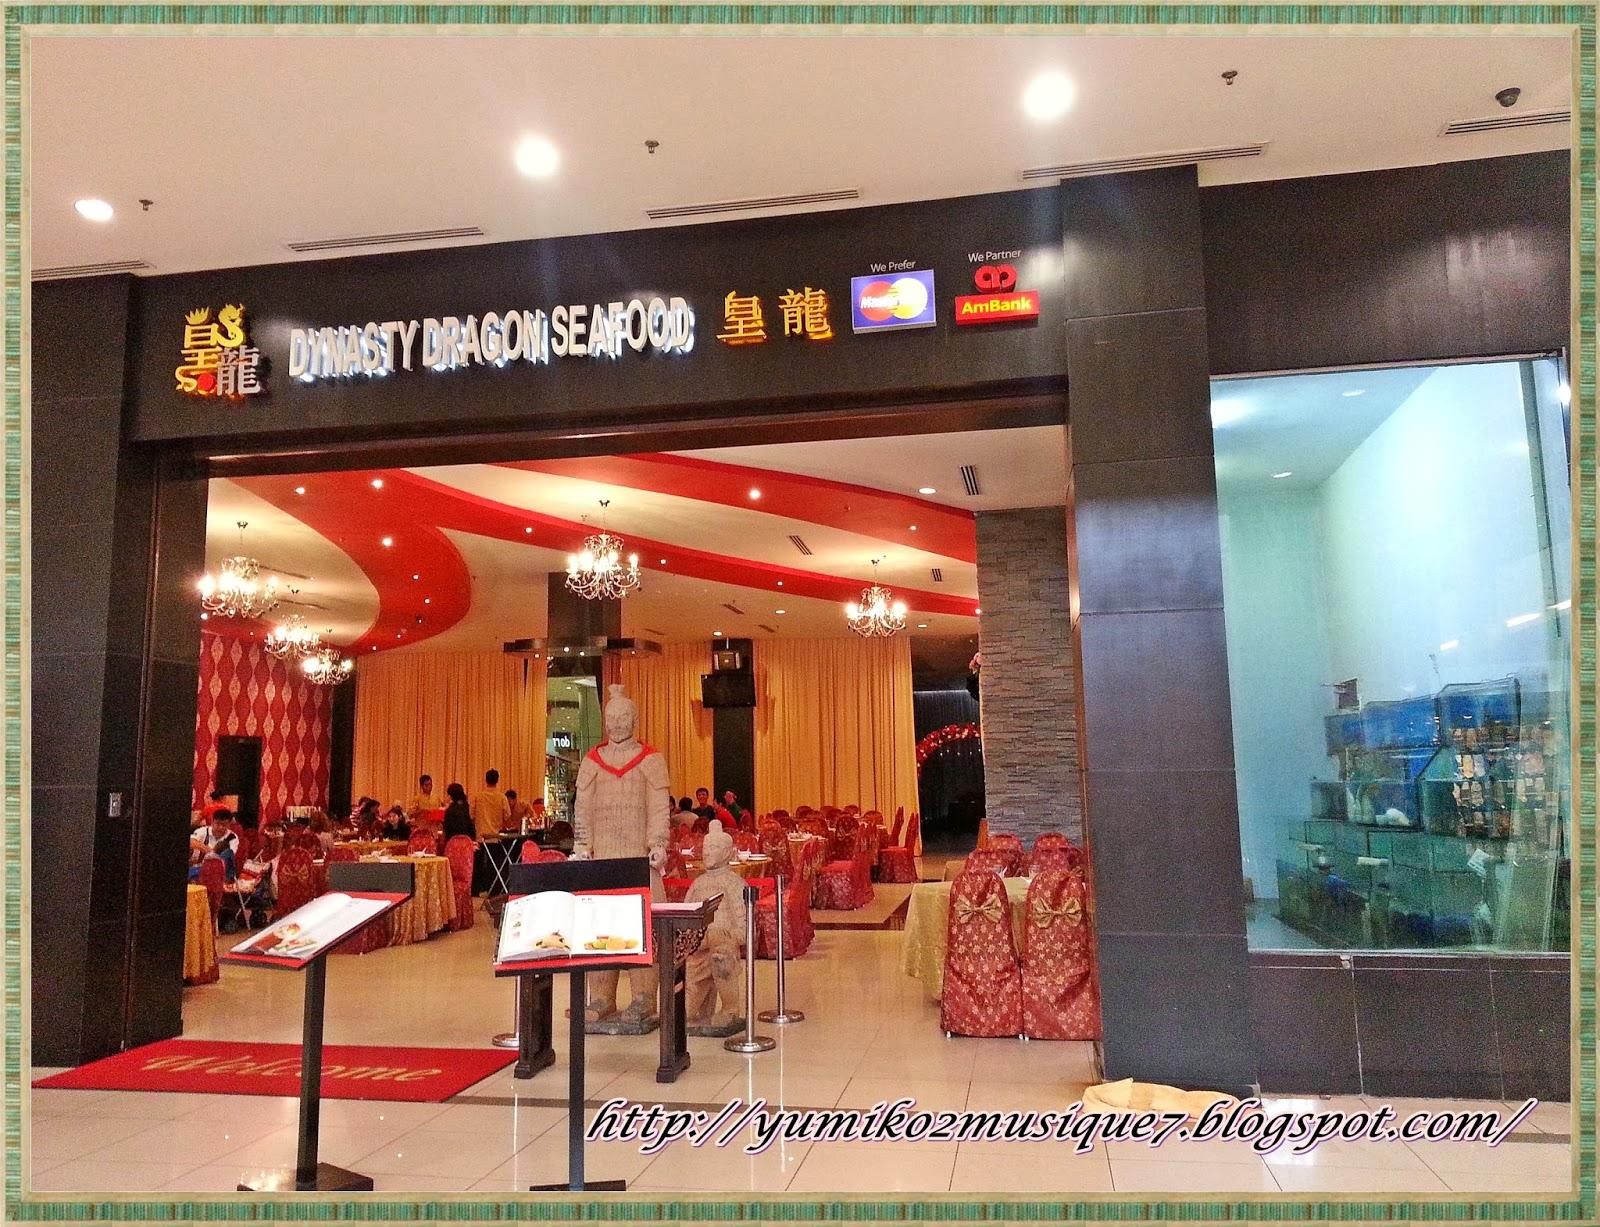 Dynasty dragon seafood restaurant ioi mall puchong